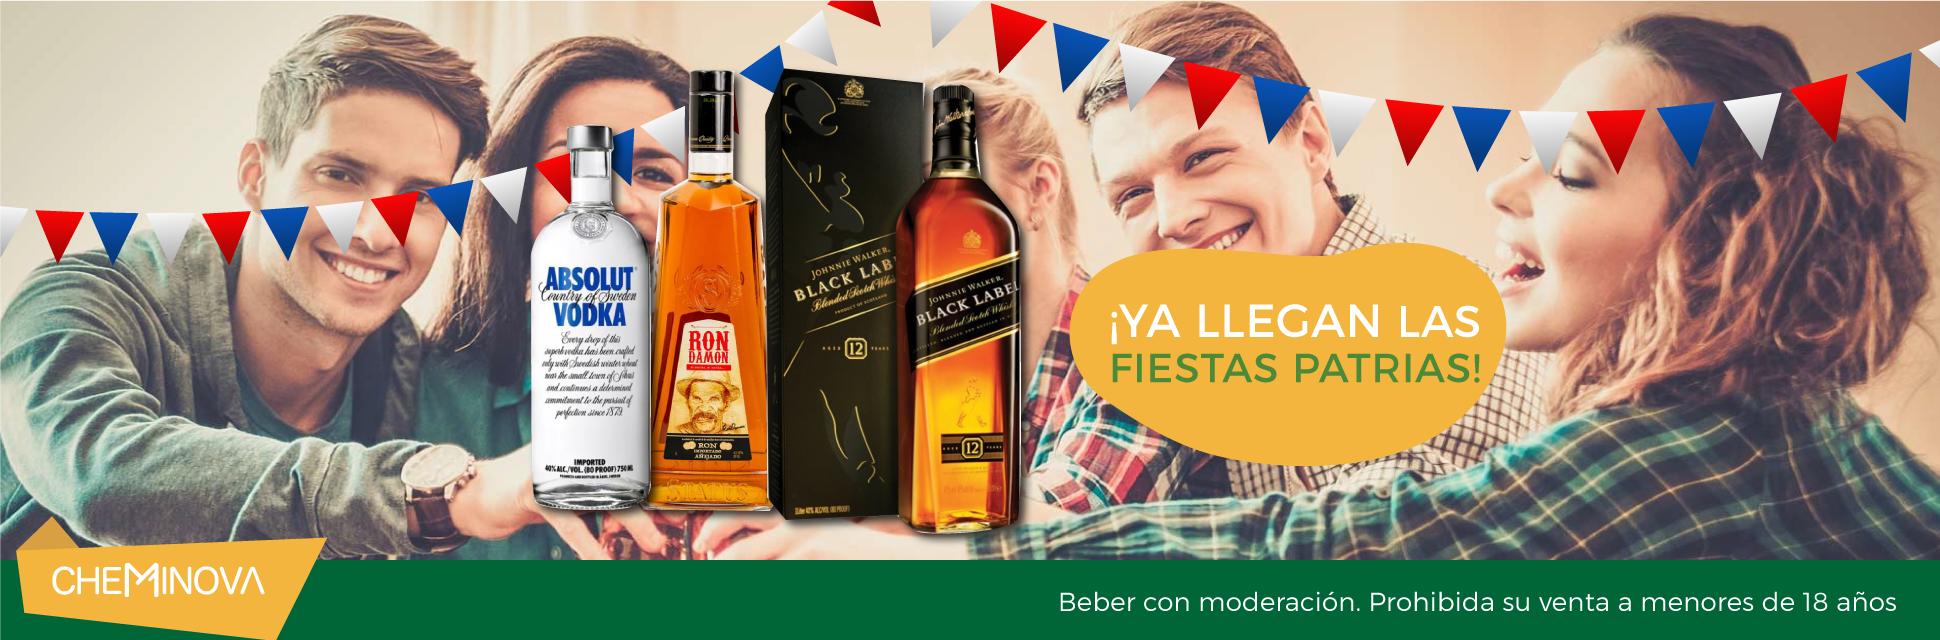 BANNER_Fiestas_Patrias_Alcohol_Sept2021.png